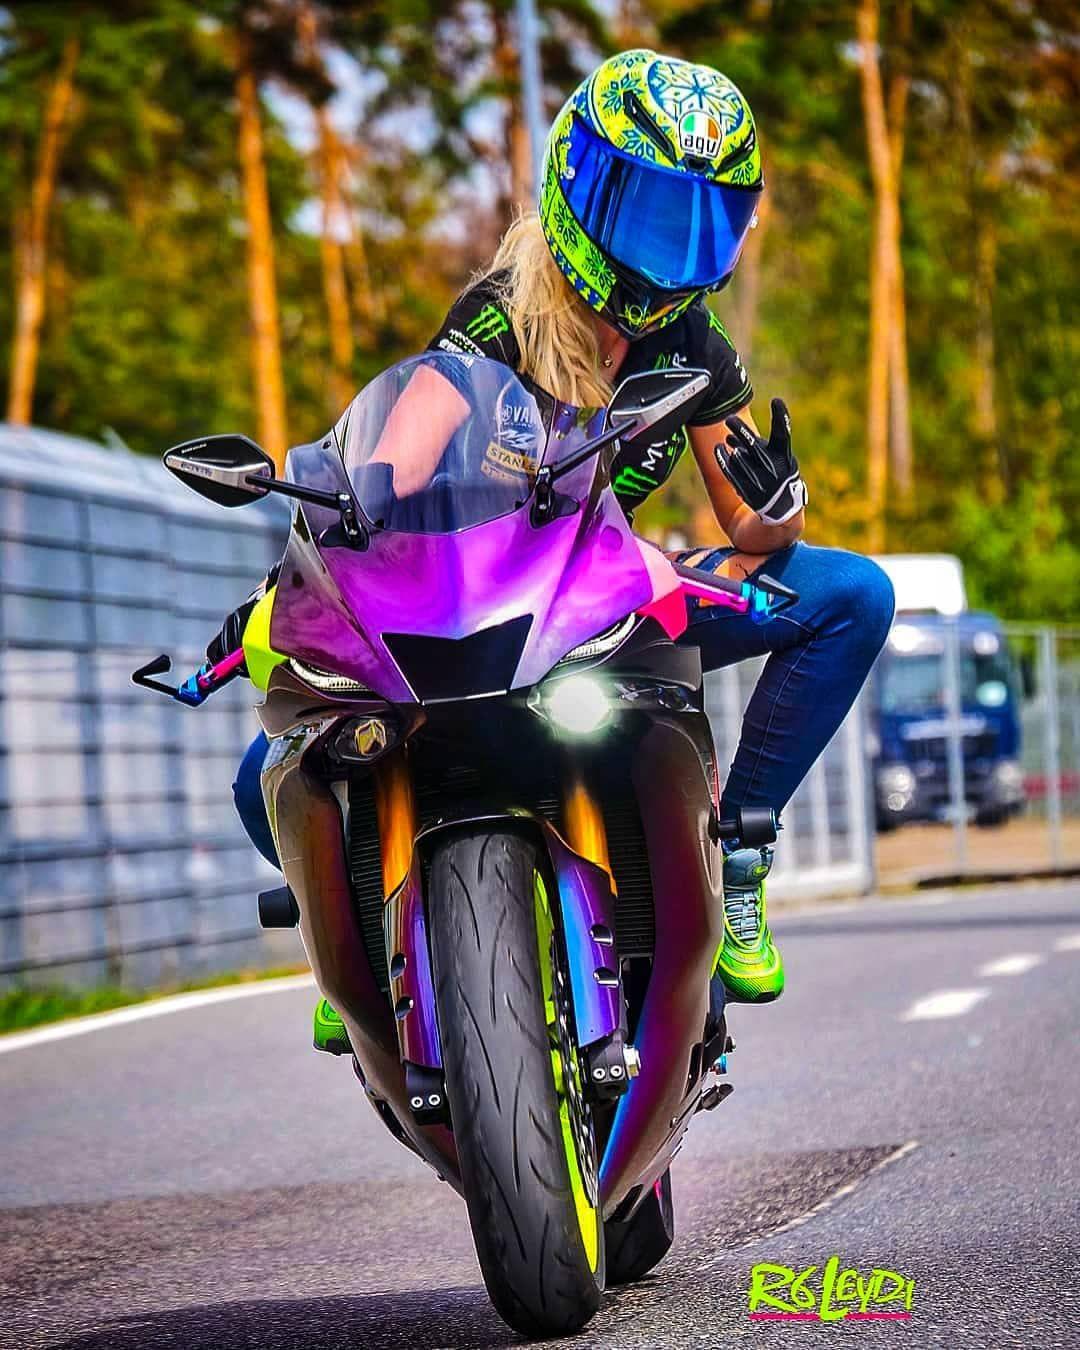 Pin On Car Motorcycle